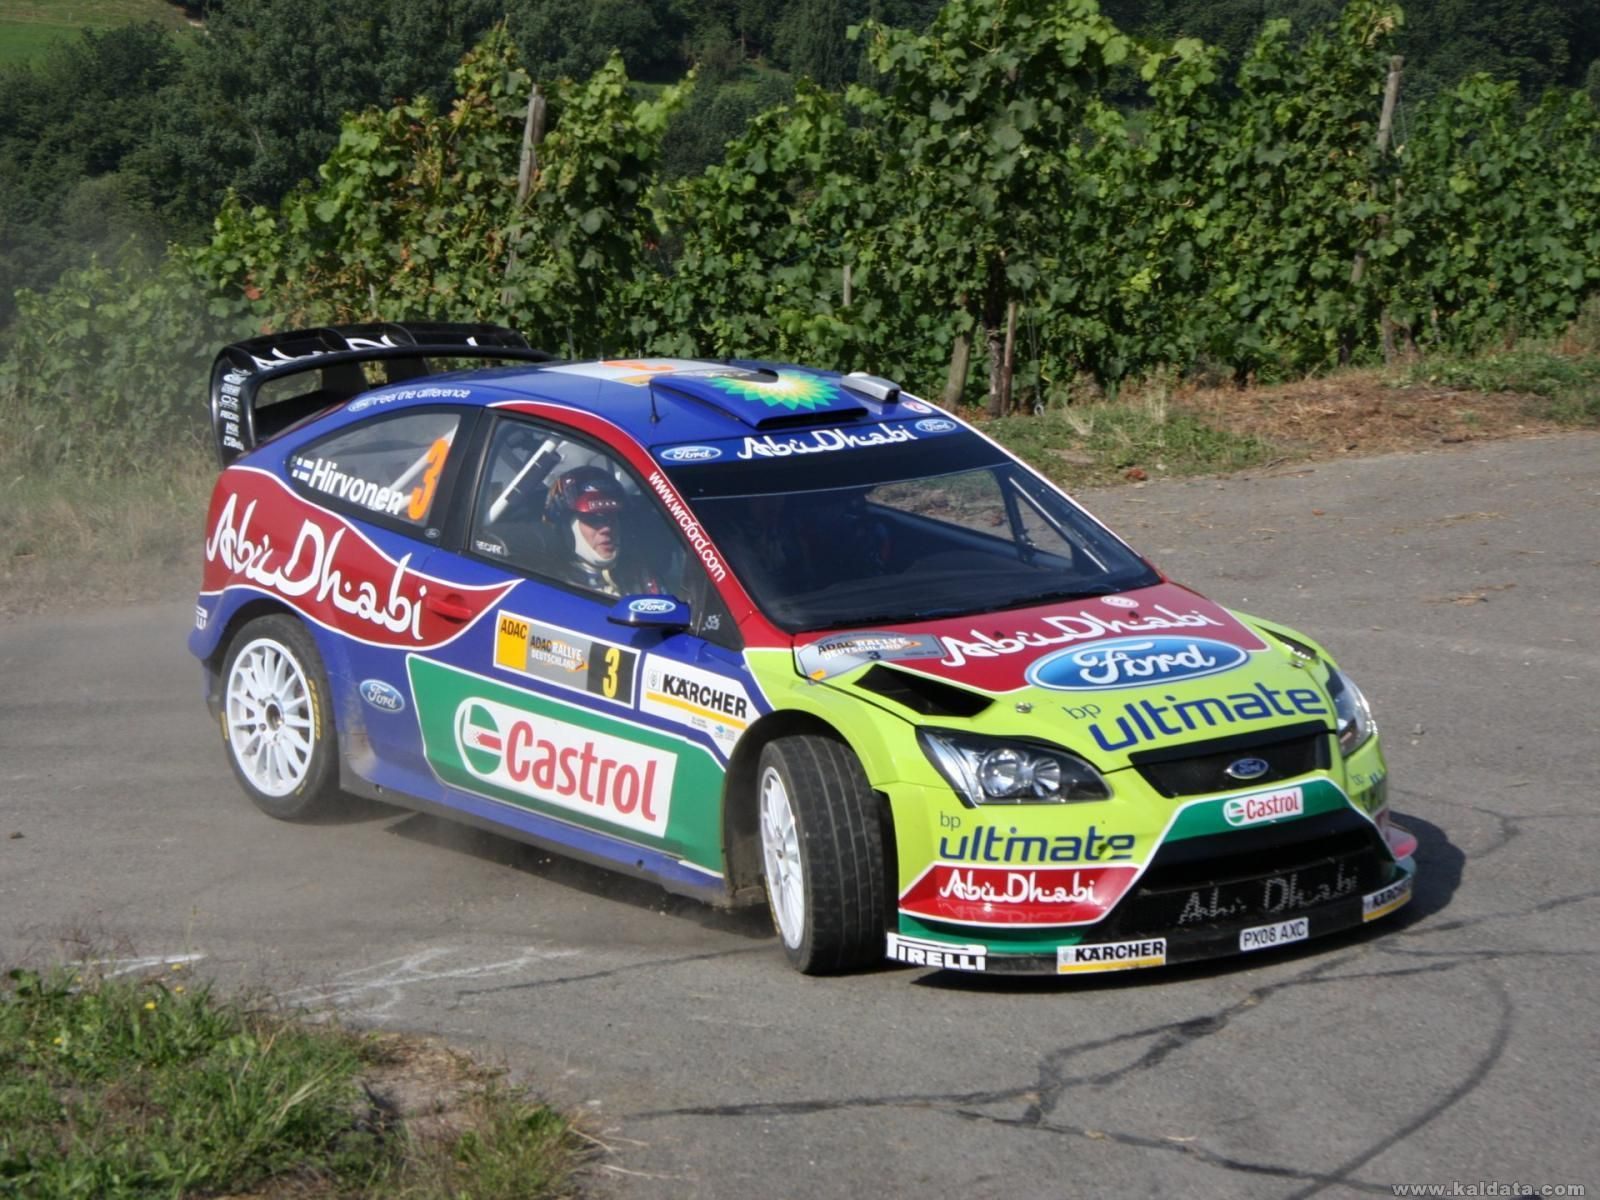 2008-Focus-RS-World-Rally-Car-Turn-Right_4232_1920_1440.jpg